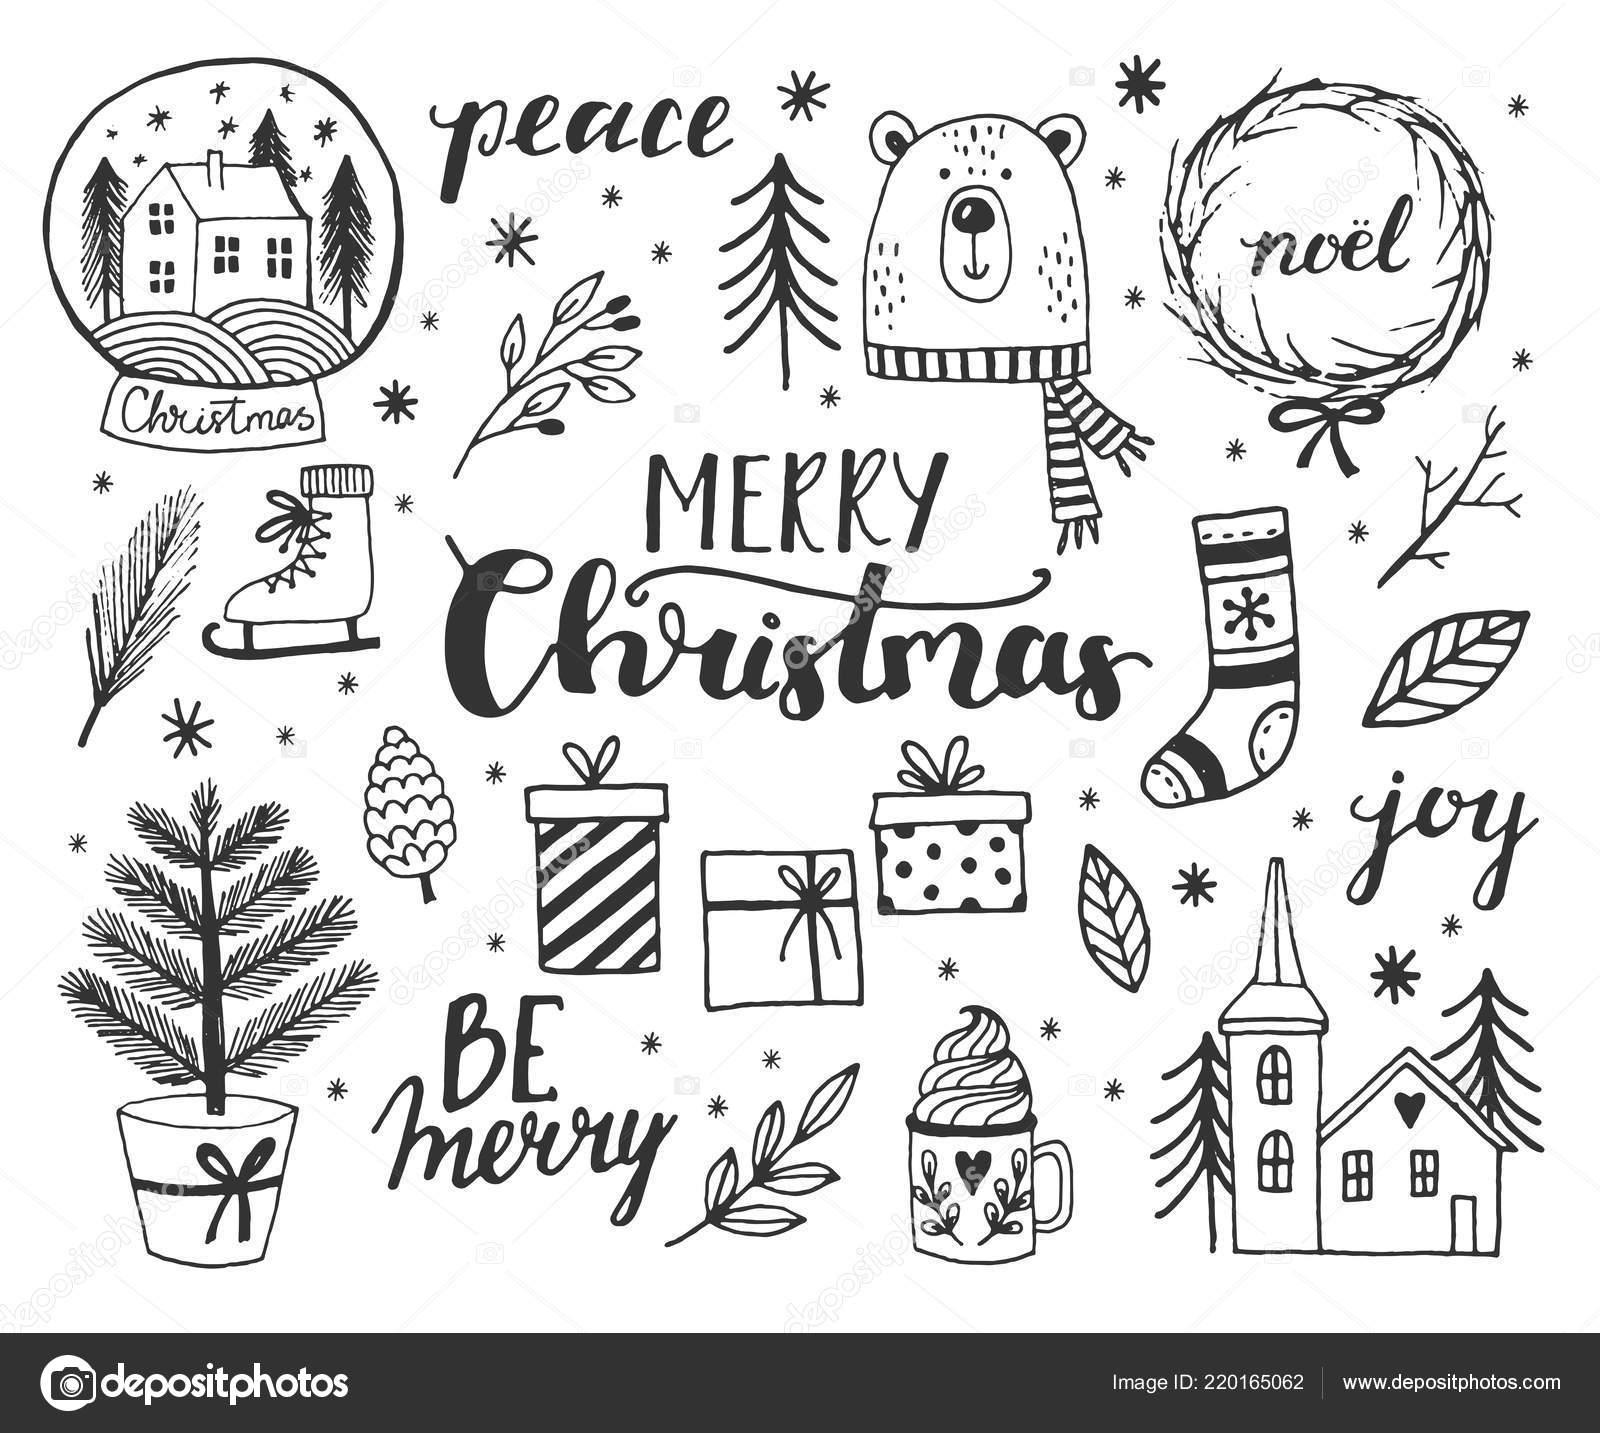 Christmas Present Drawings.Drawings Christmas Art Hand Drawn Doodle Vector